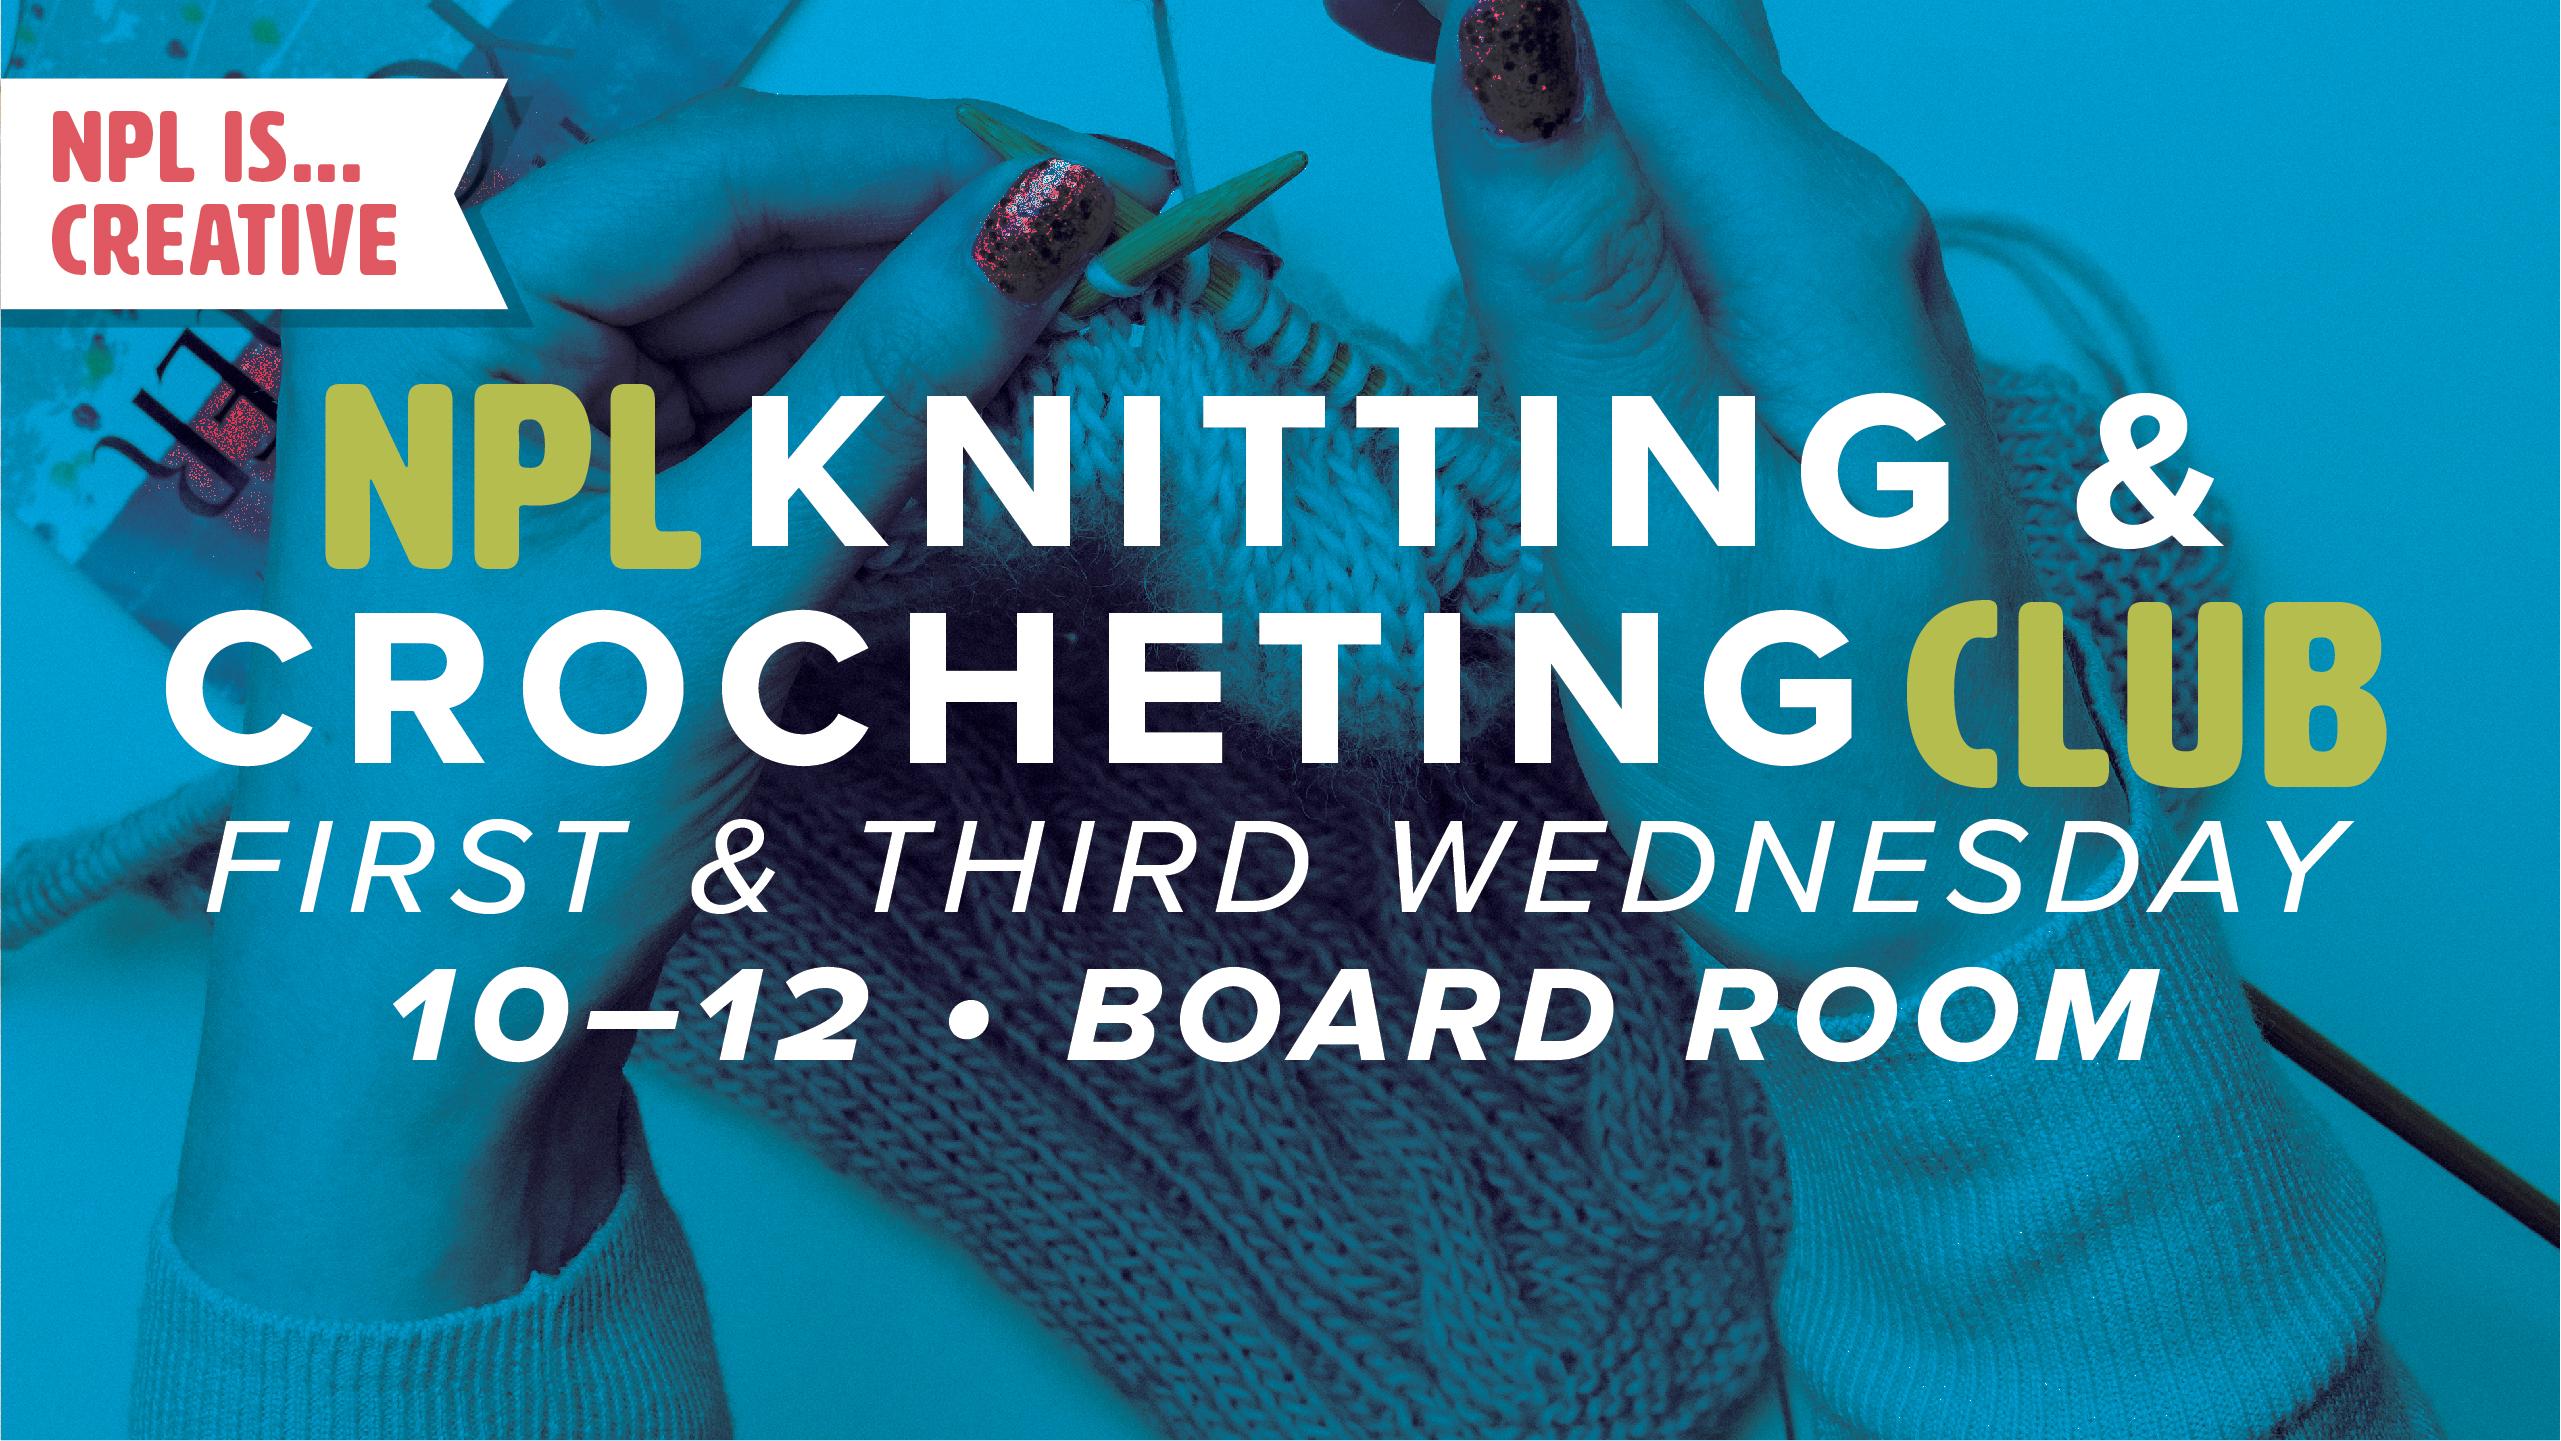 Knitting & Crocheting Club